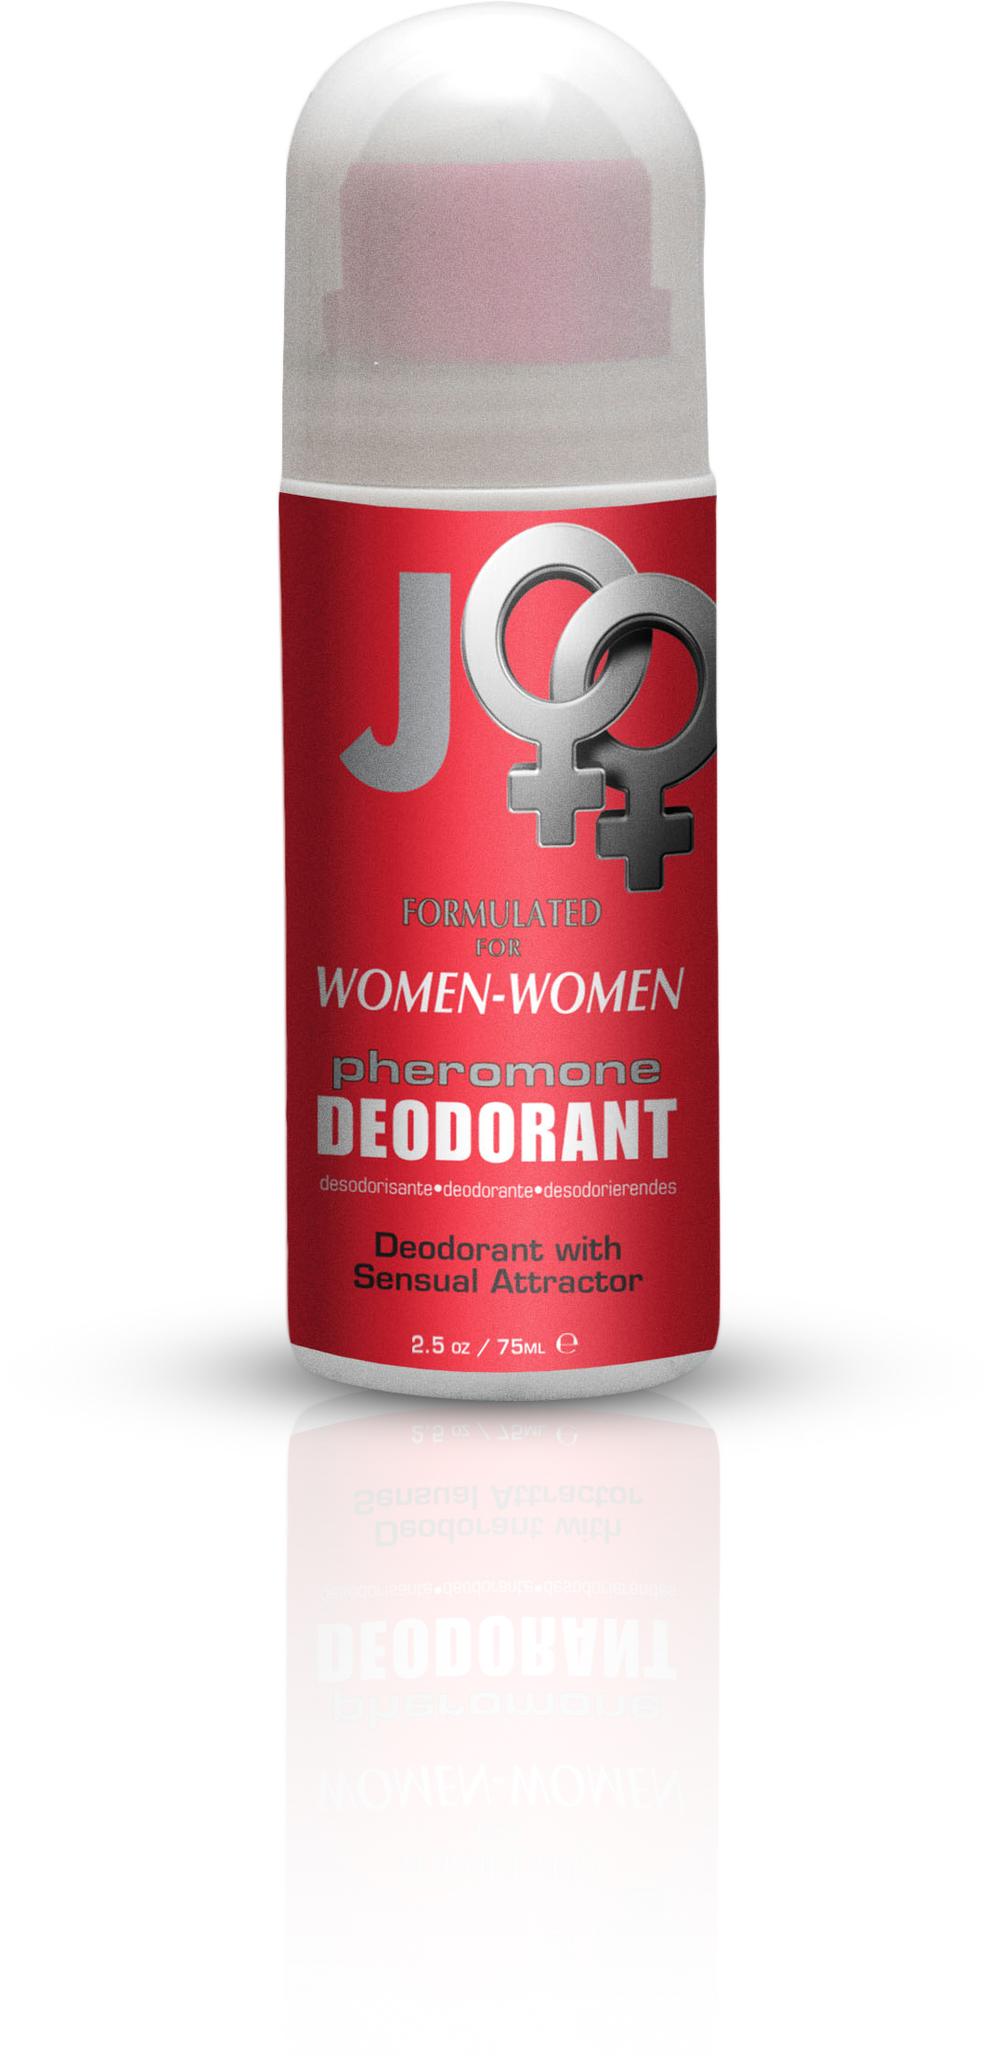 40223_JO_pheromone_deodorant_women-women_2.5oz.jpg